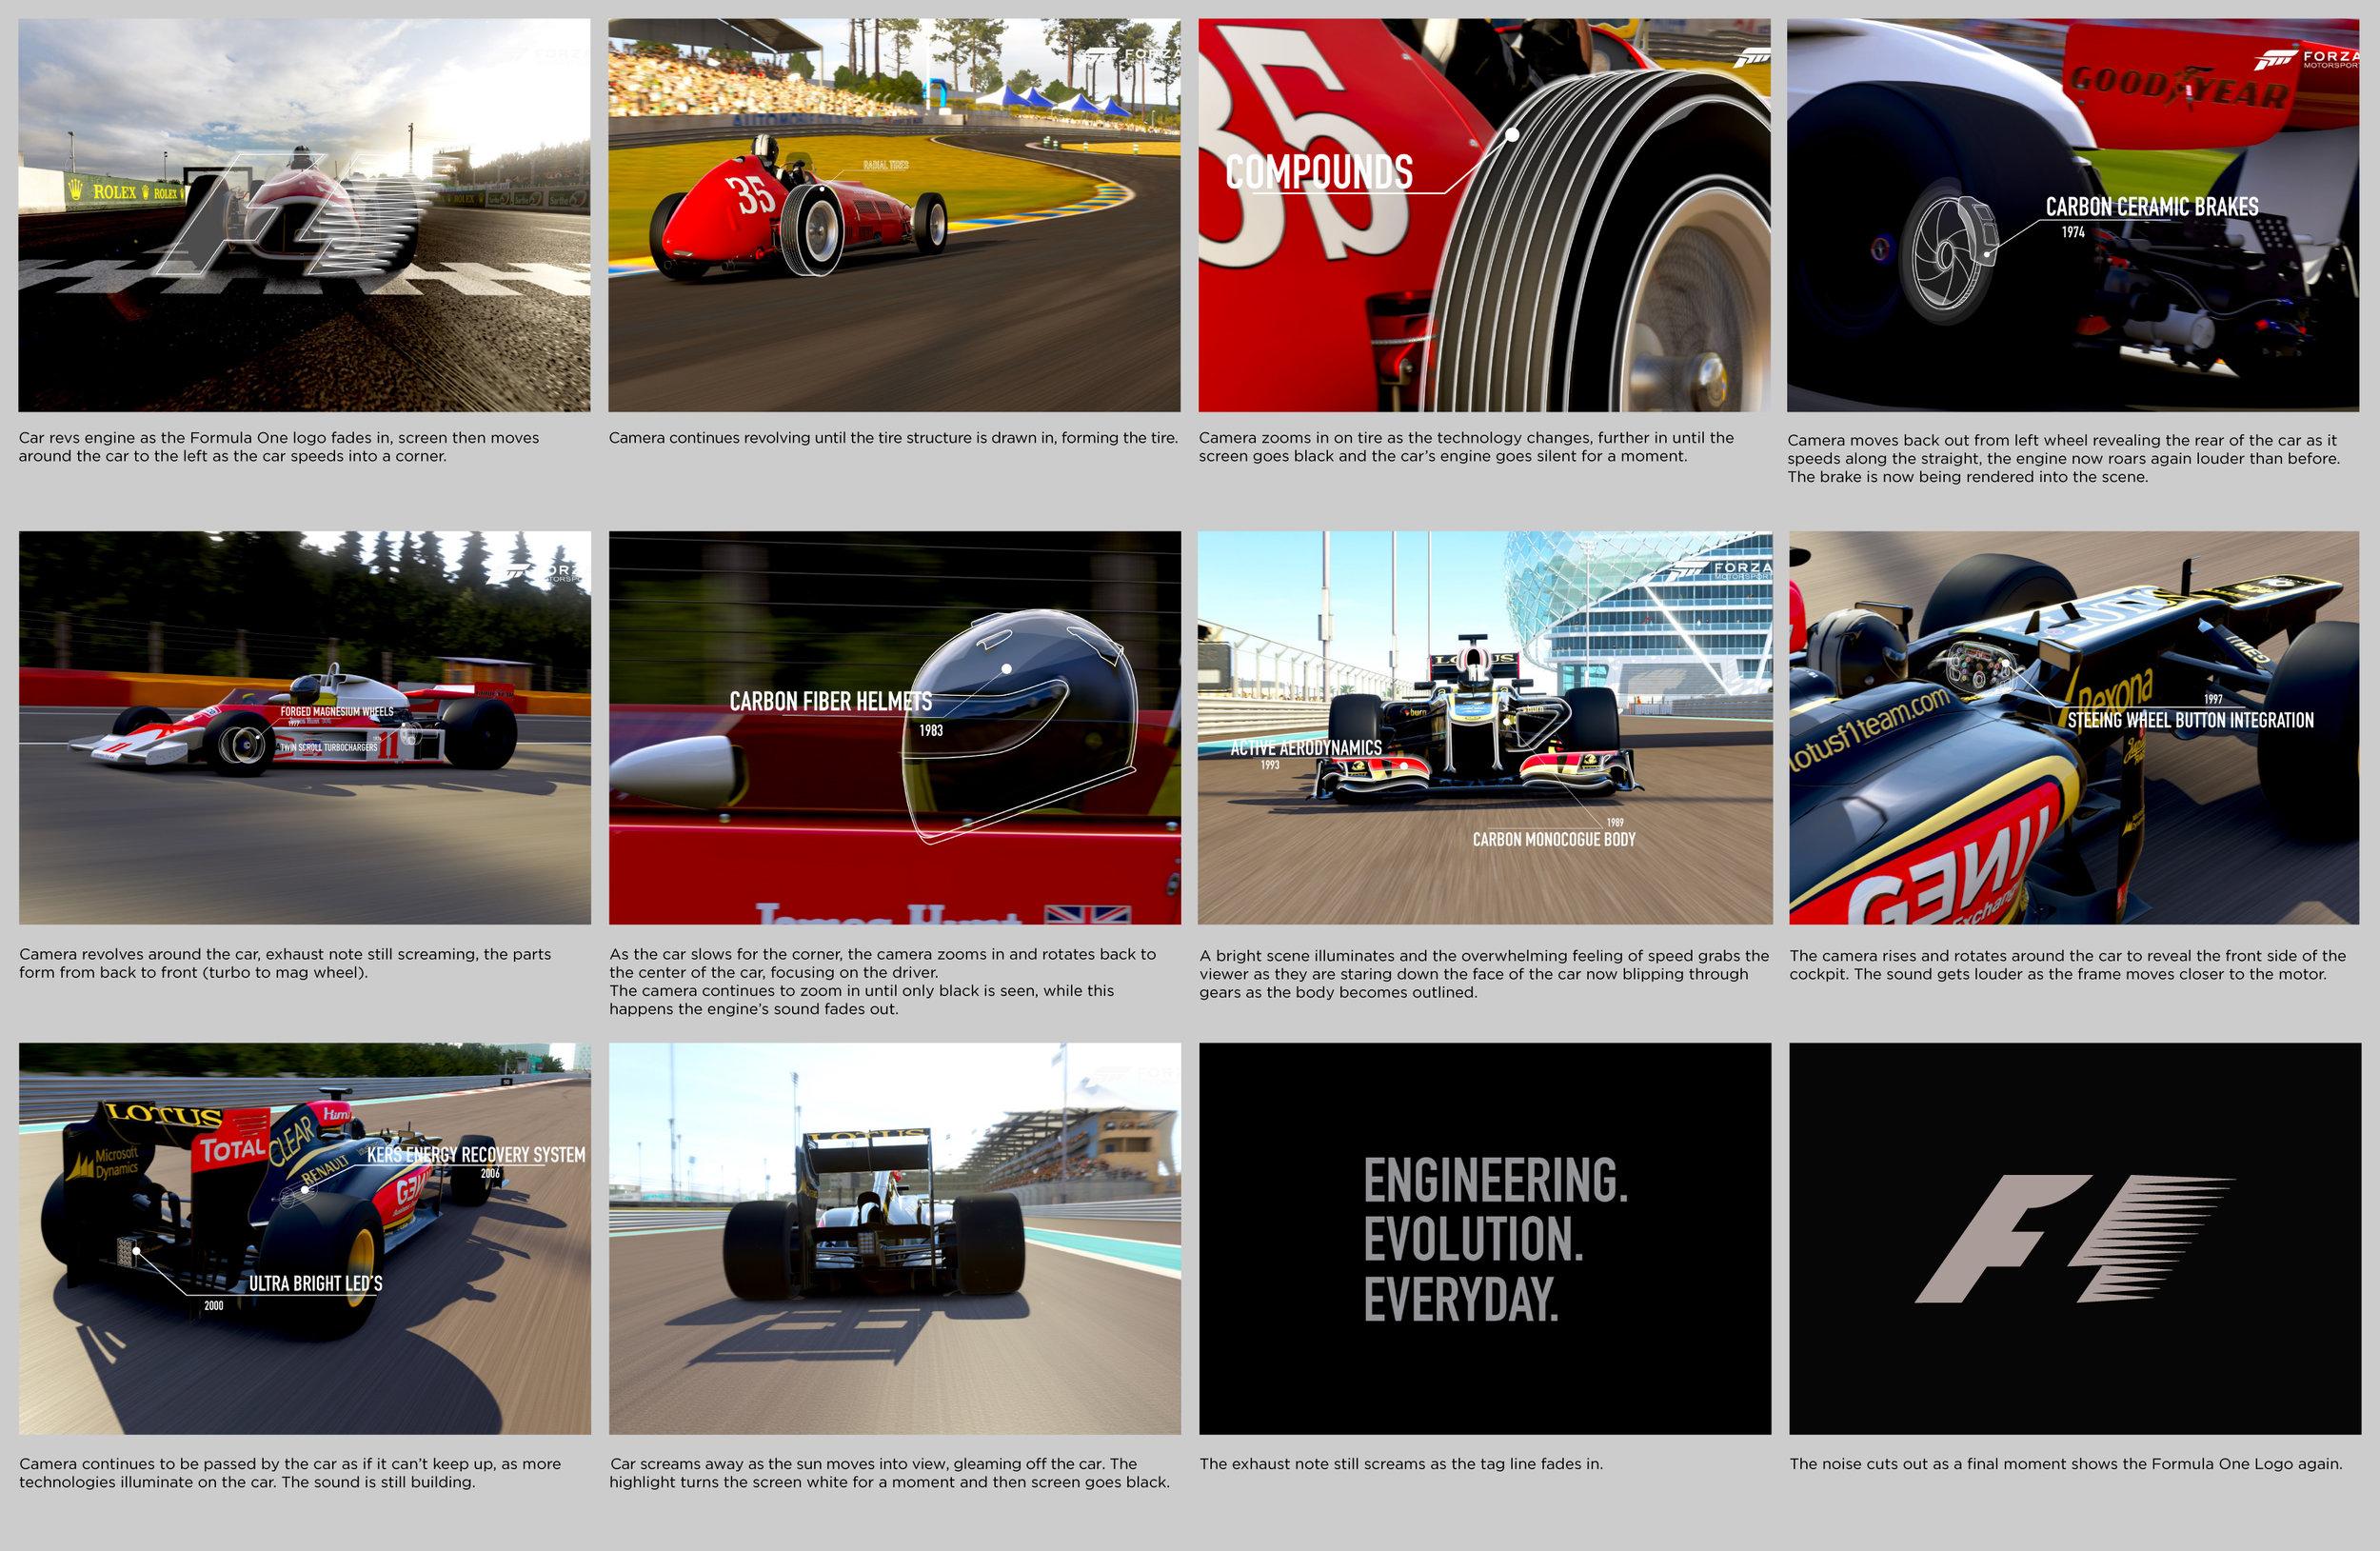 F1_50thAnniv_Detail_30sMotionConcept-08.jpg